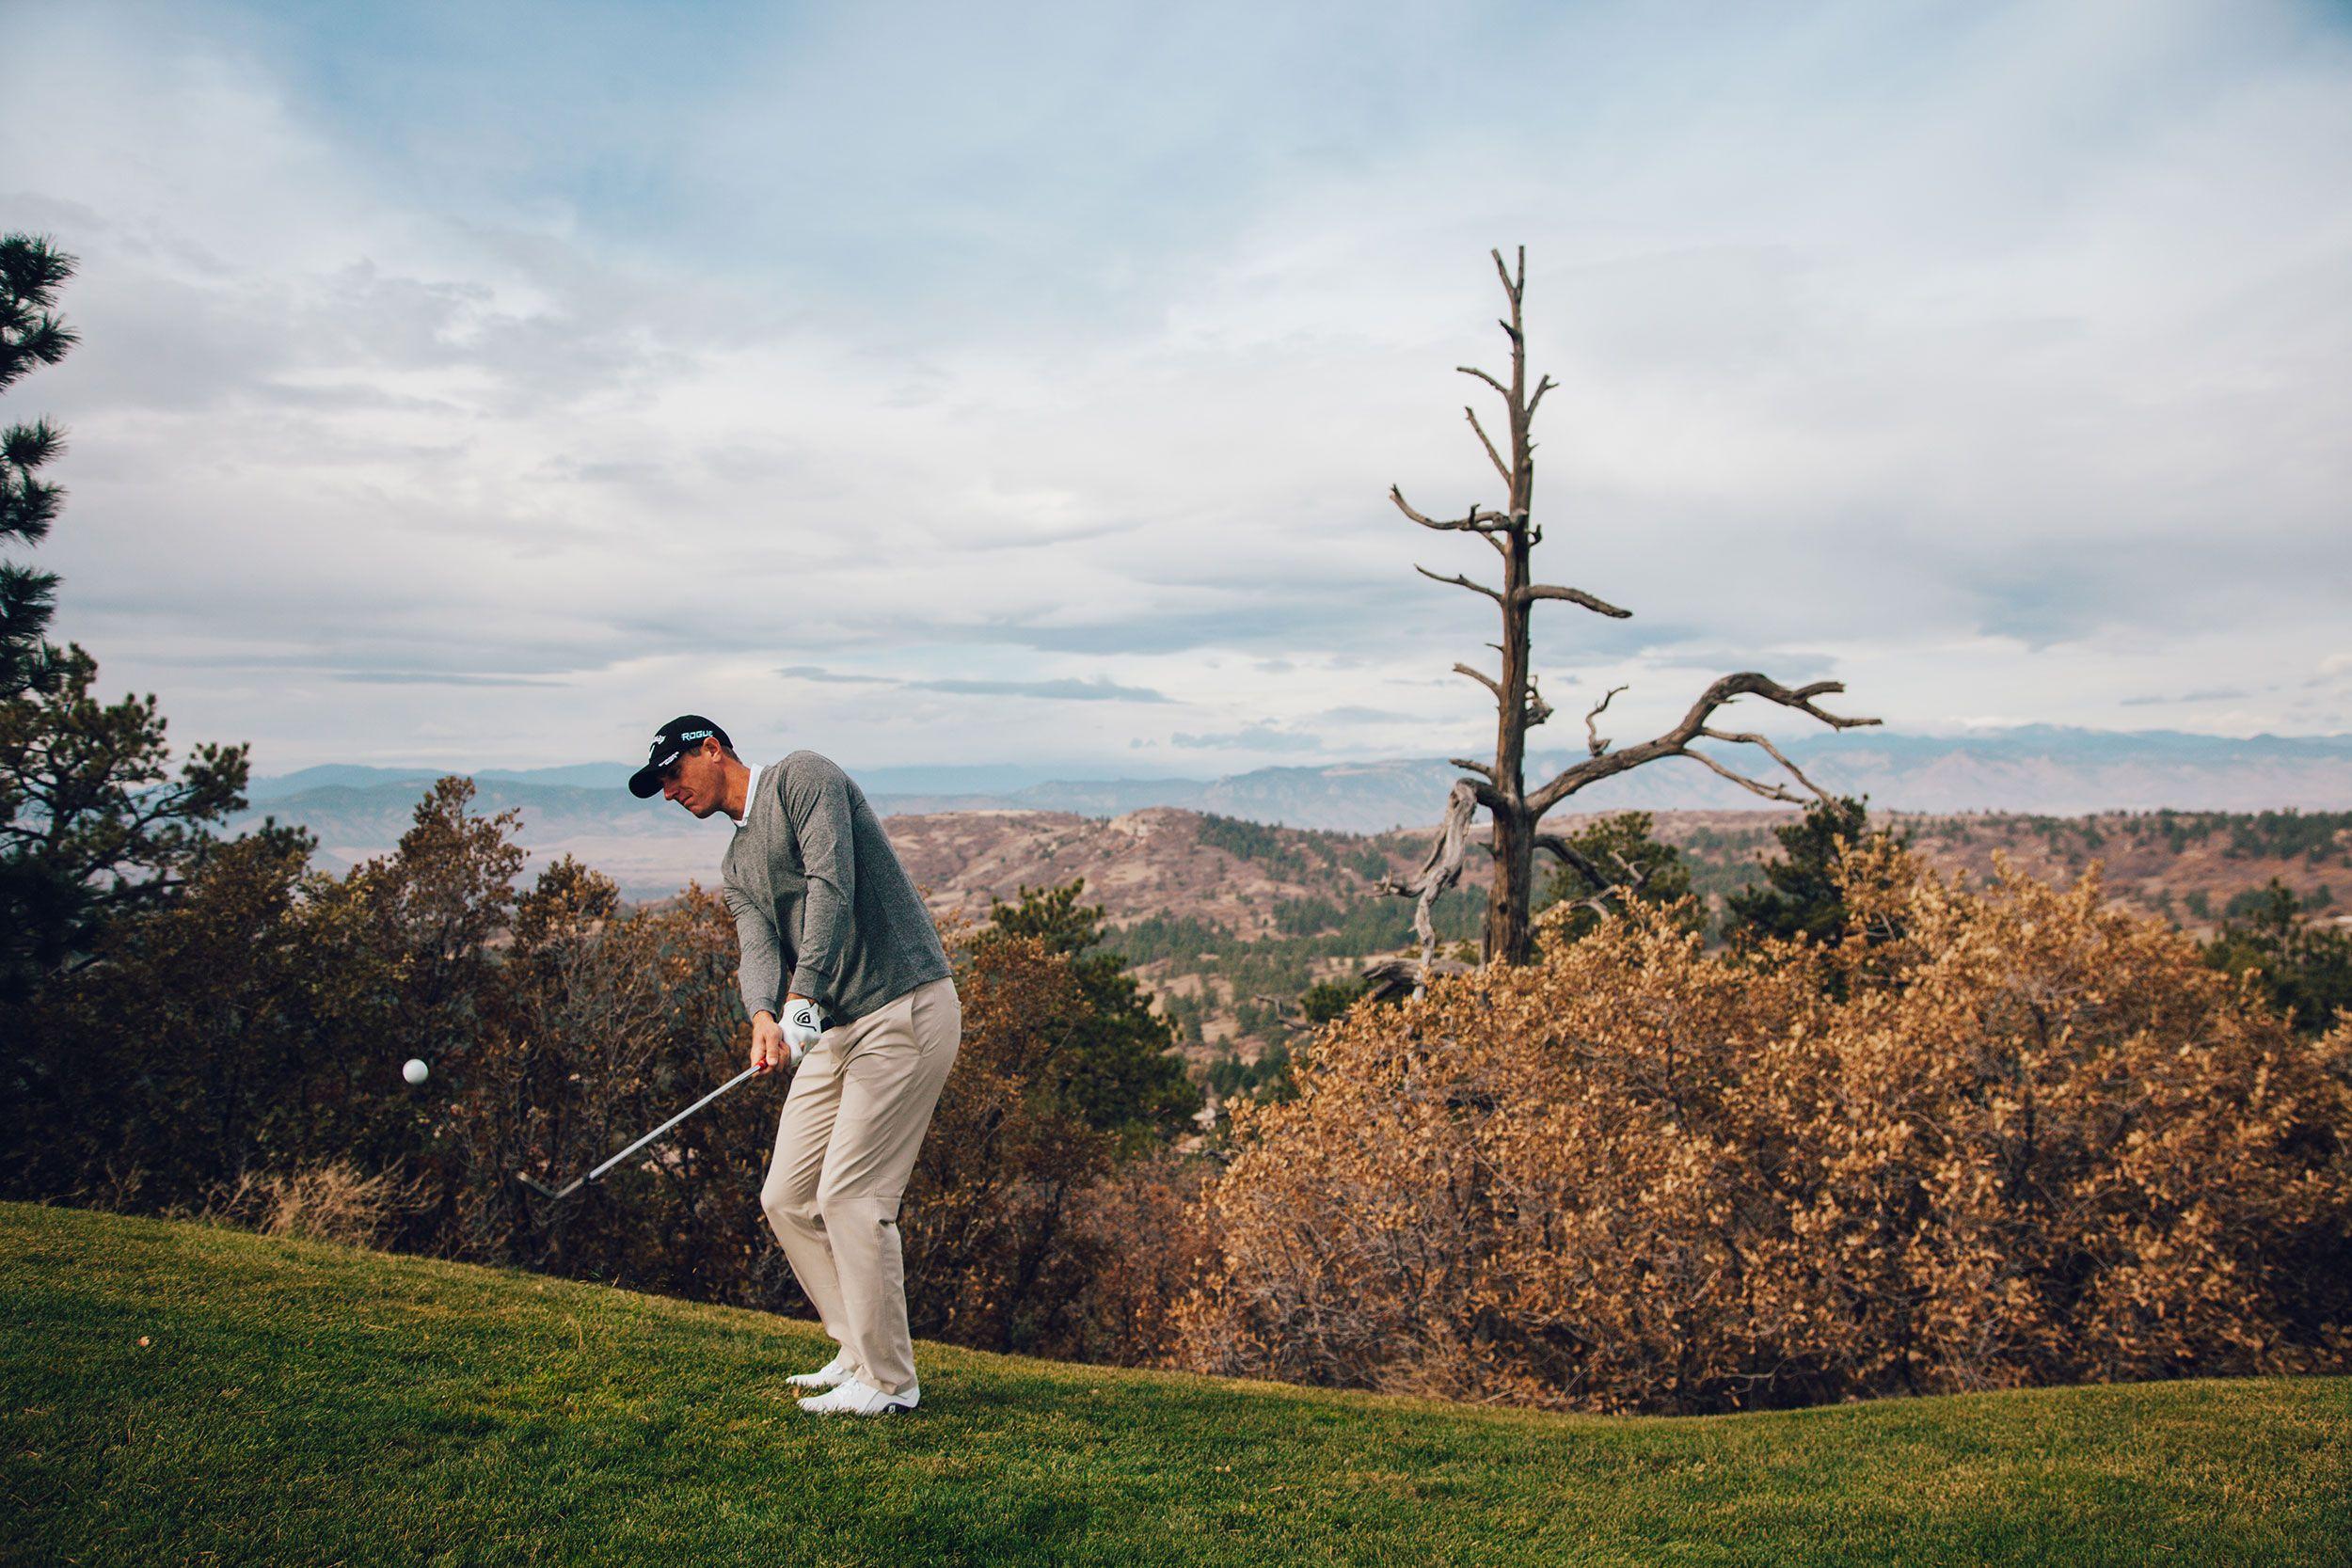 26+ Castle pines international golf course ideas in 2021